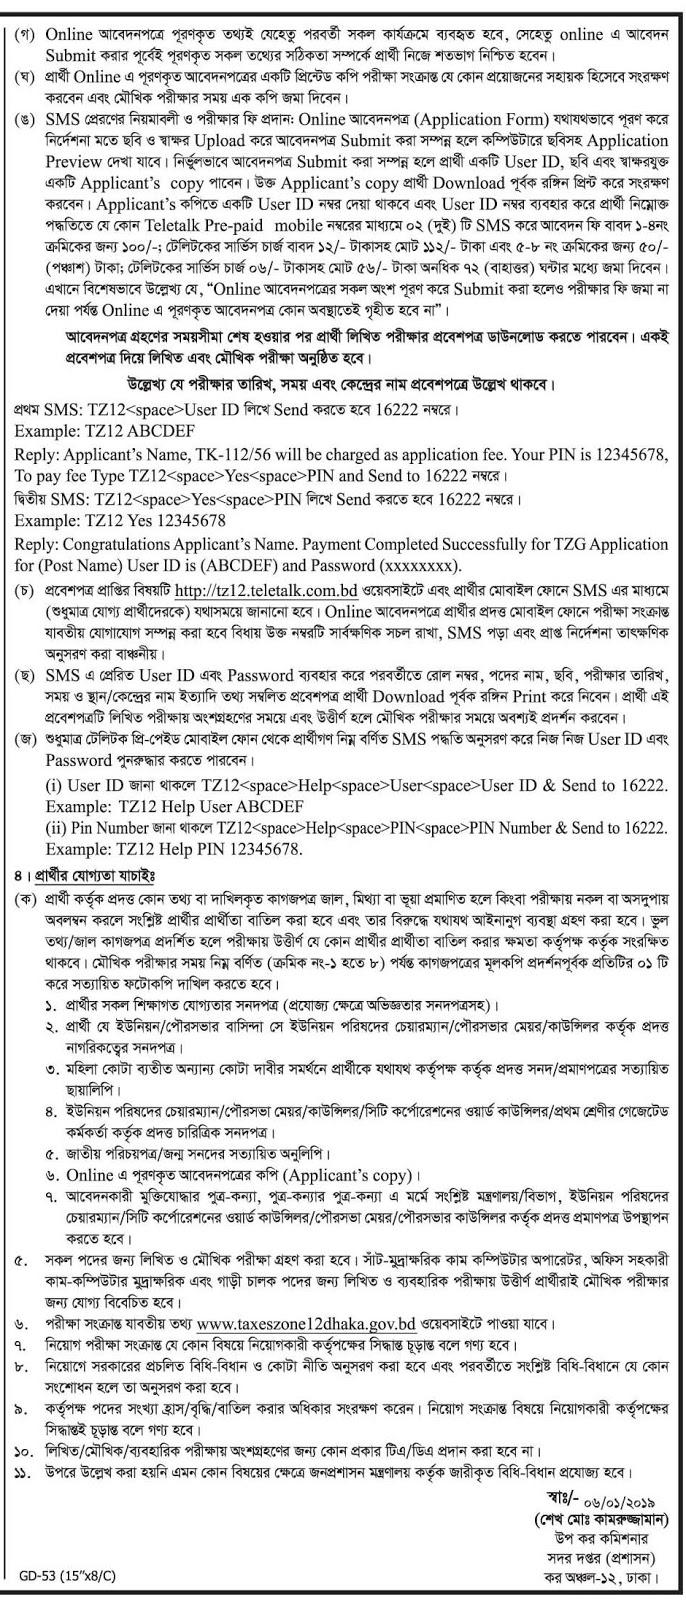 Taxes Zone-12, Dhaka Job Circular 2019